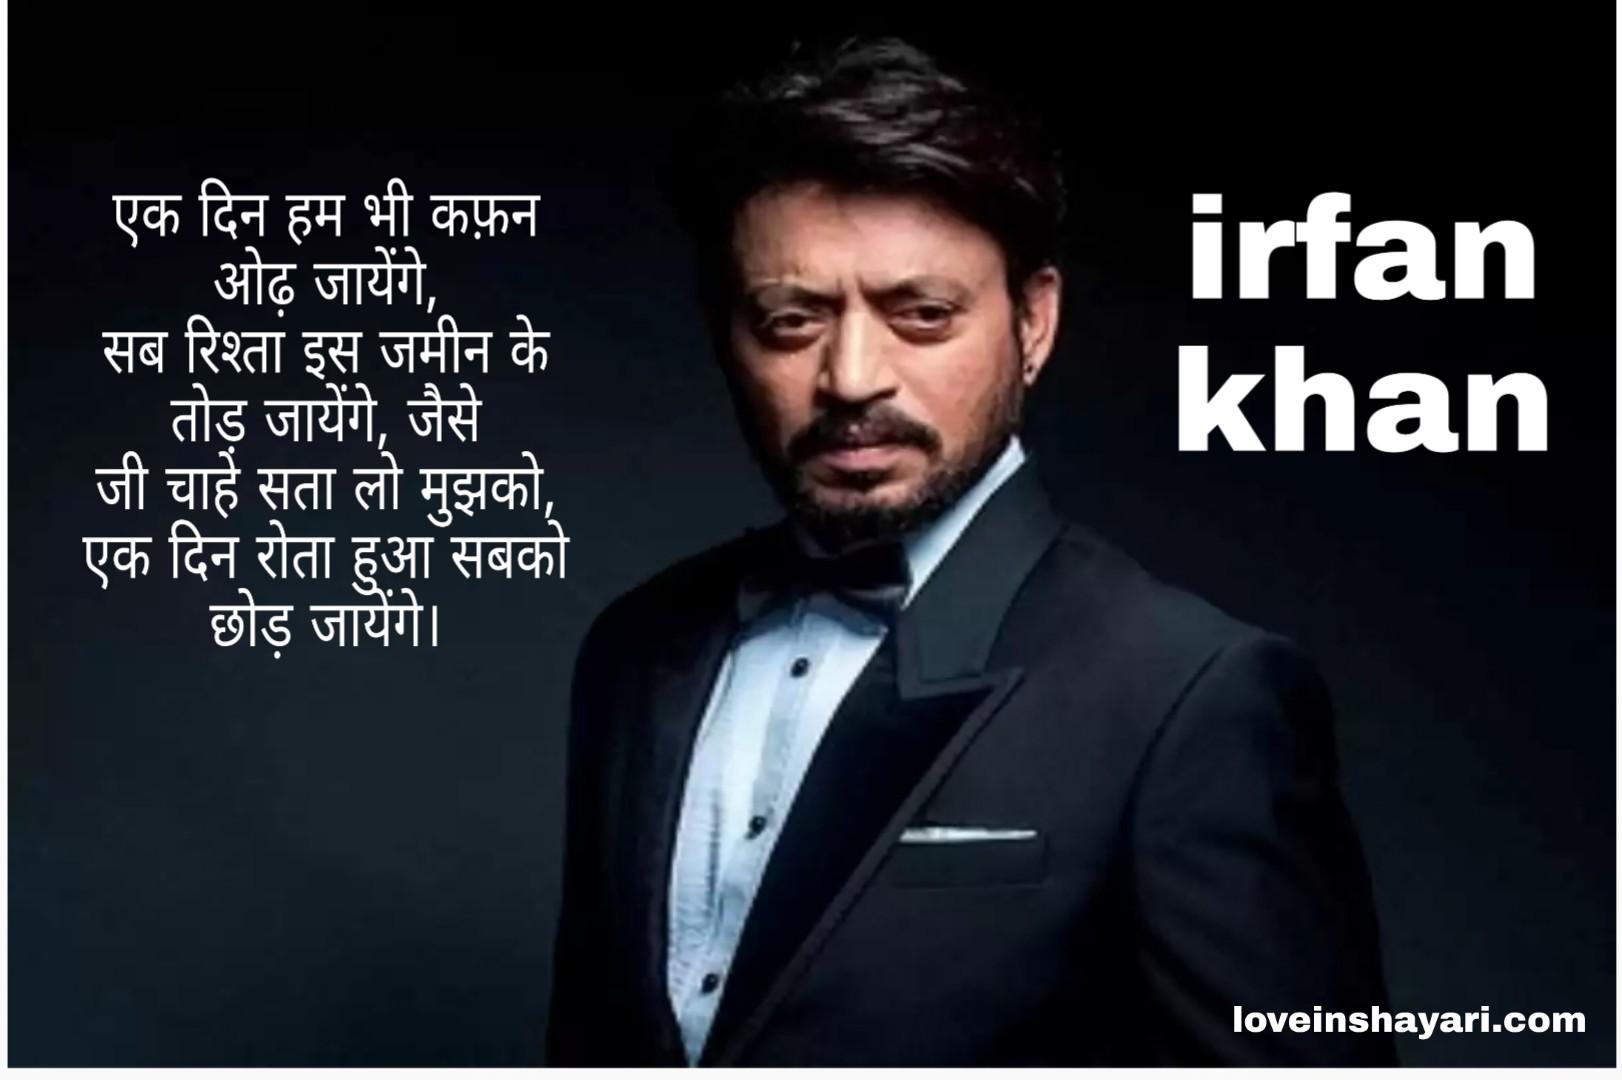 Irfan khan status whatsapp status